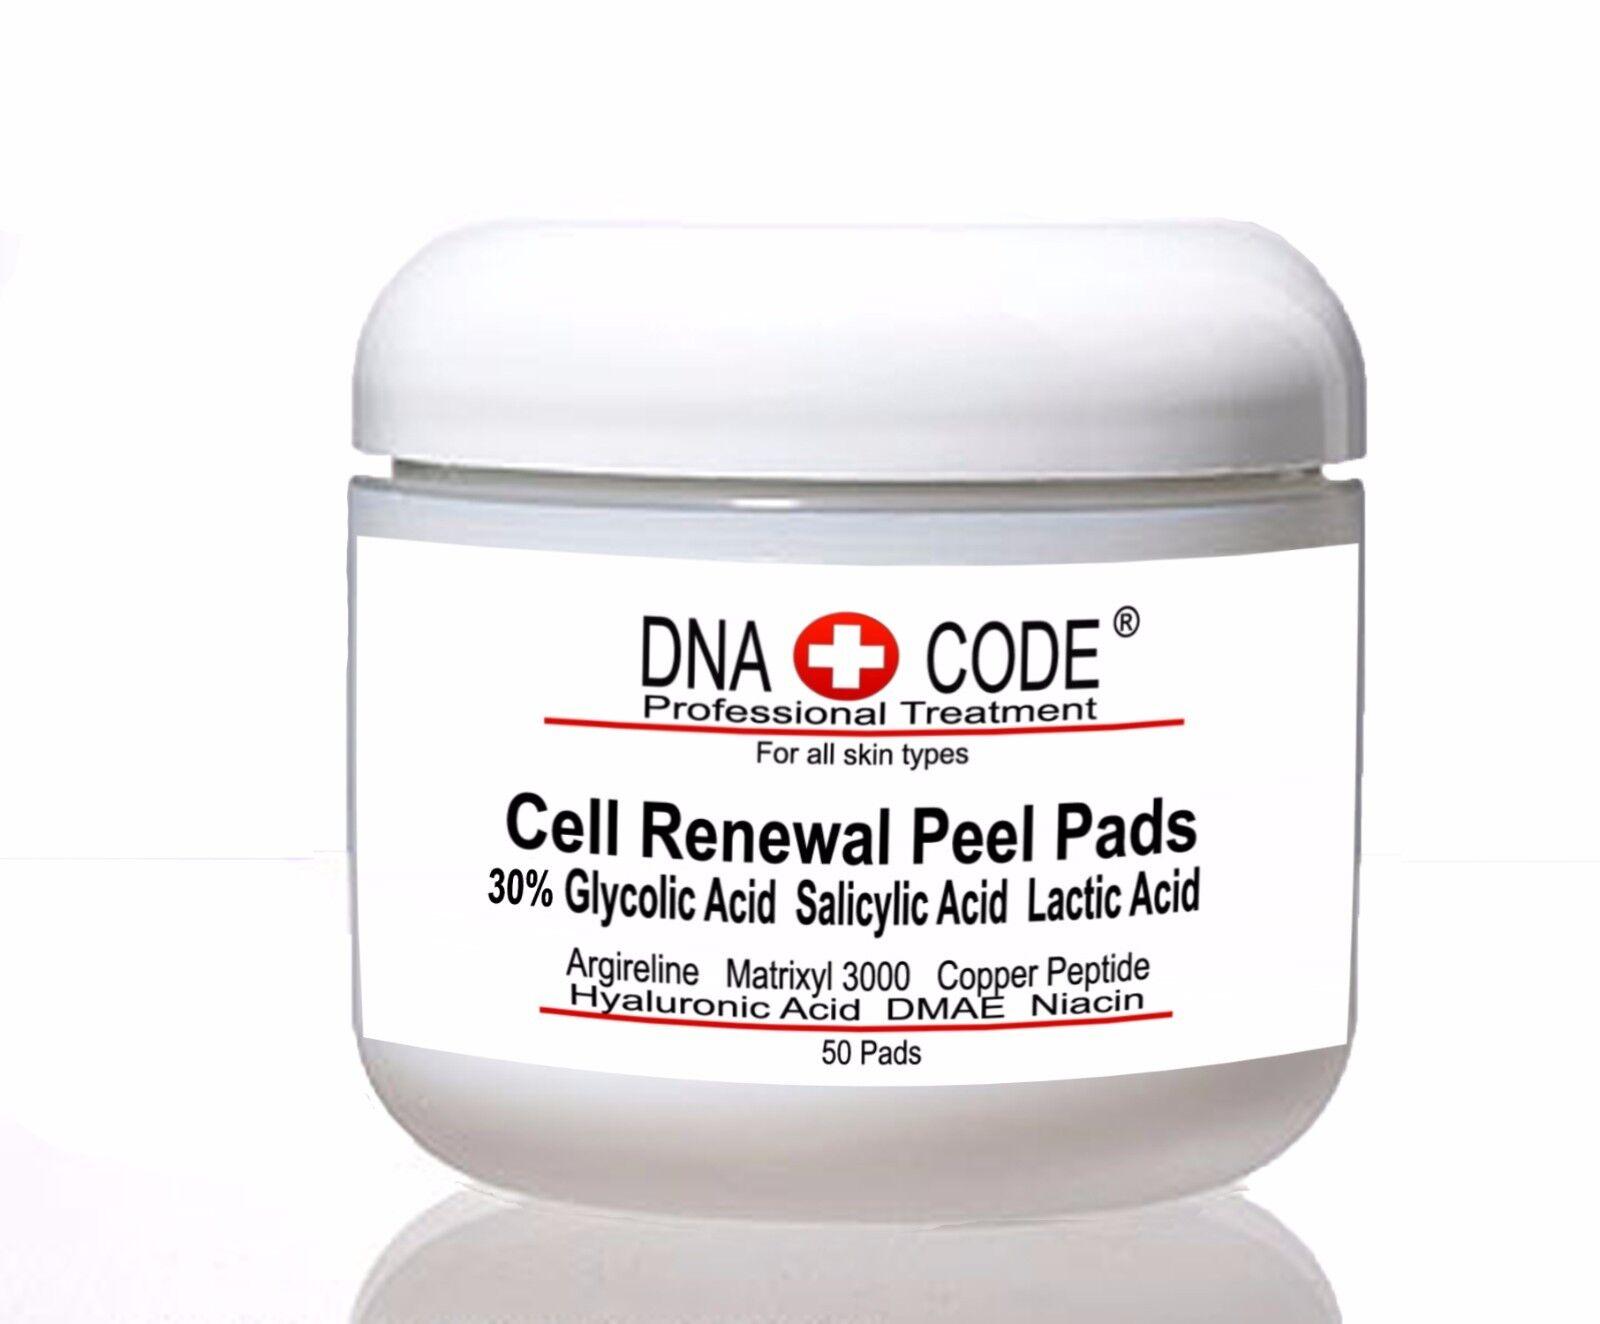 AntiAging Peel Pads-30% Glycolic Cell Renewal Peel Pads+ Sal